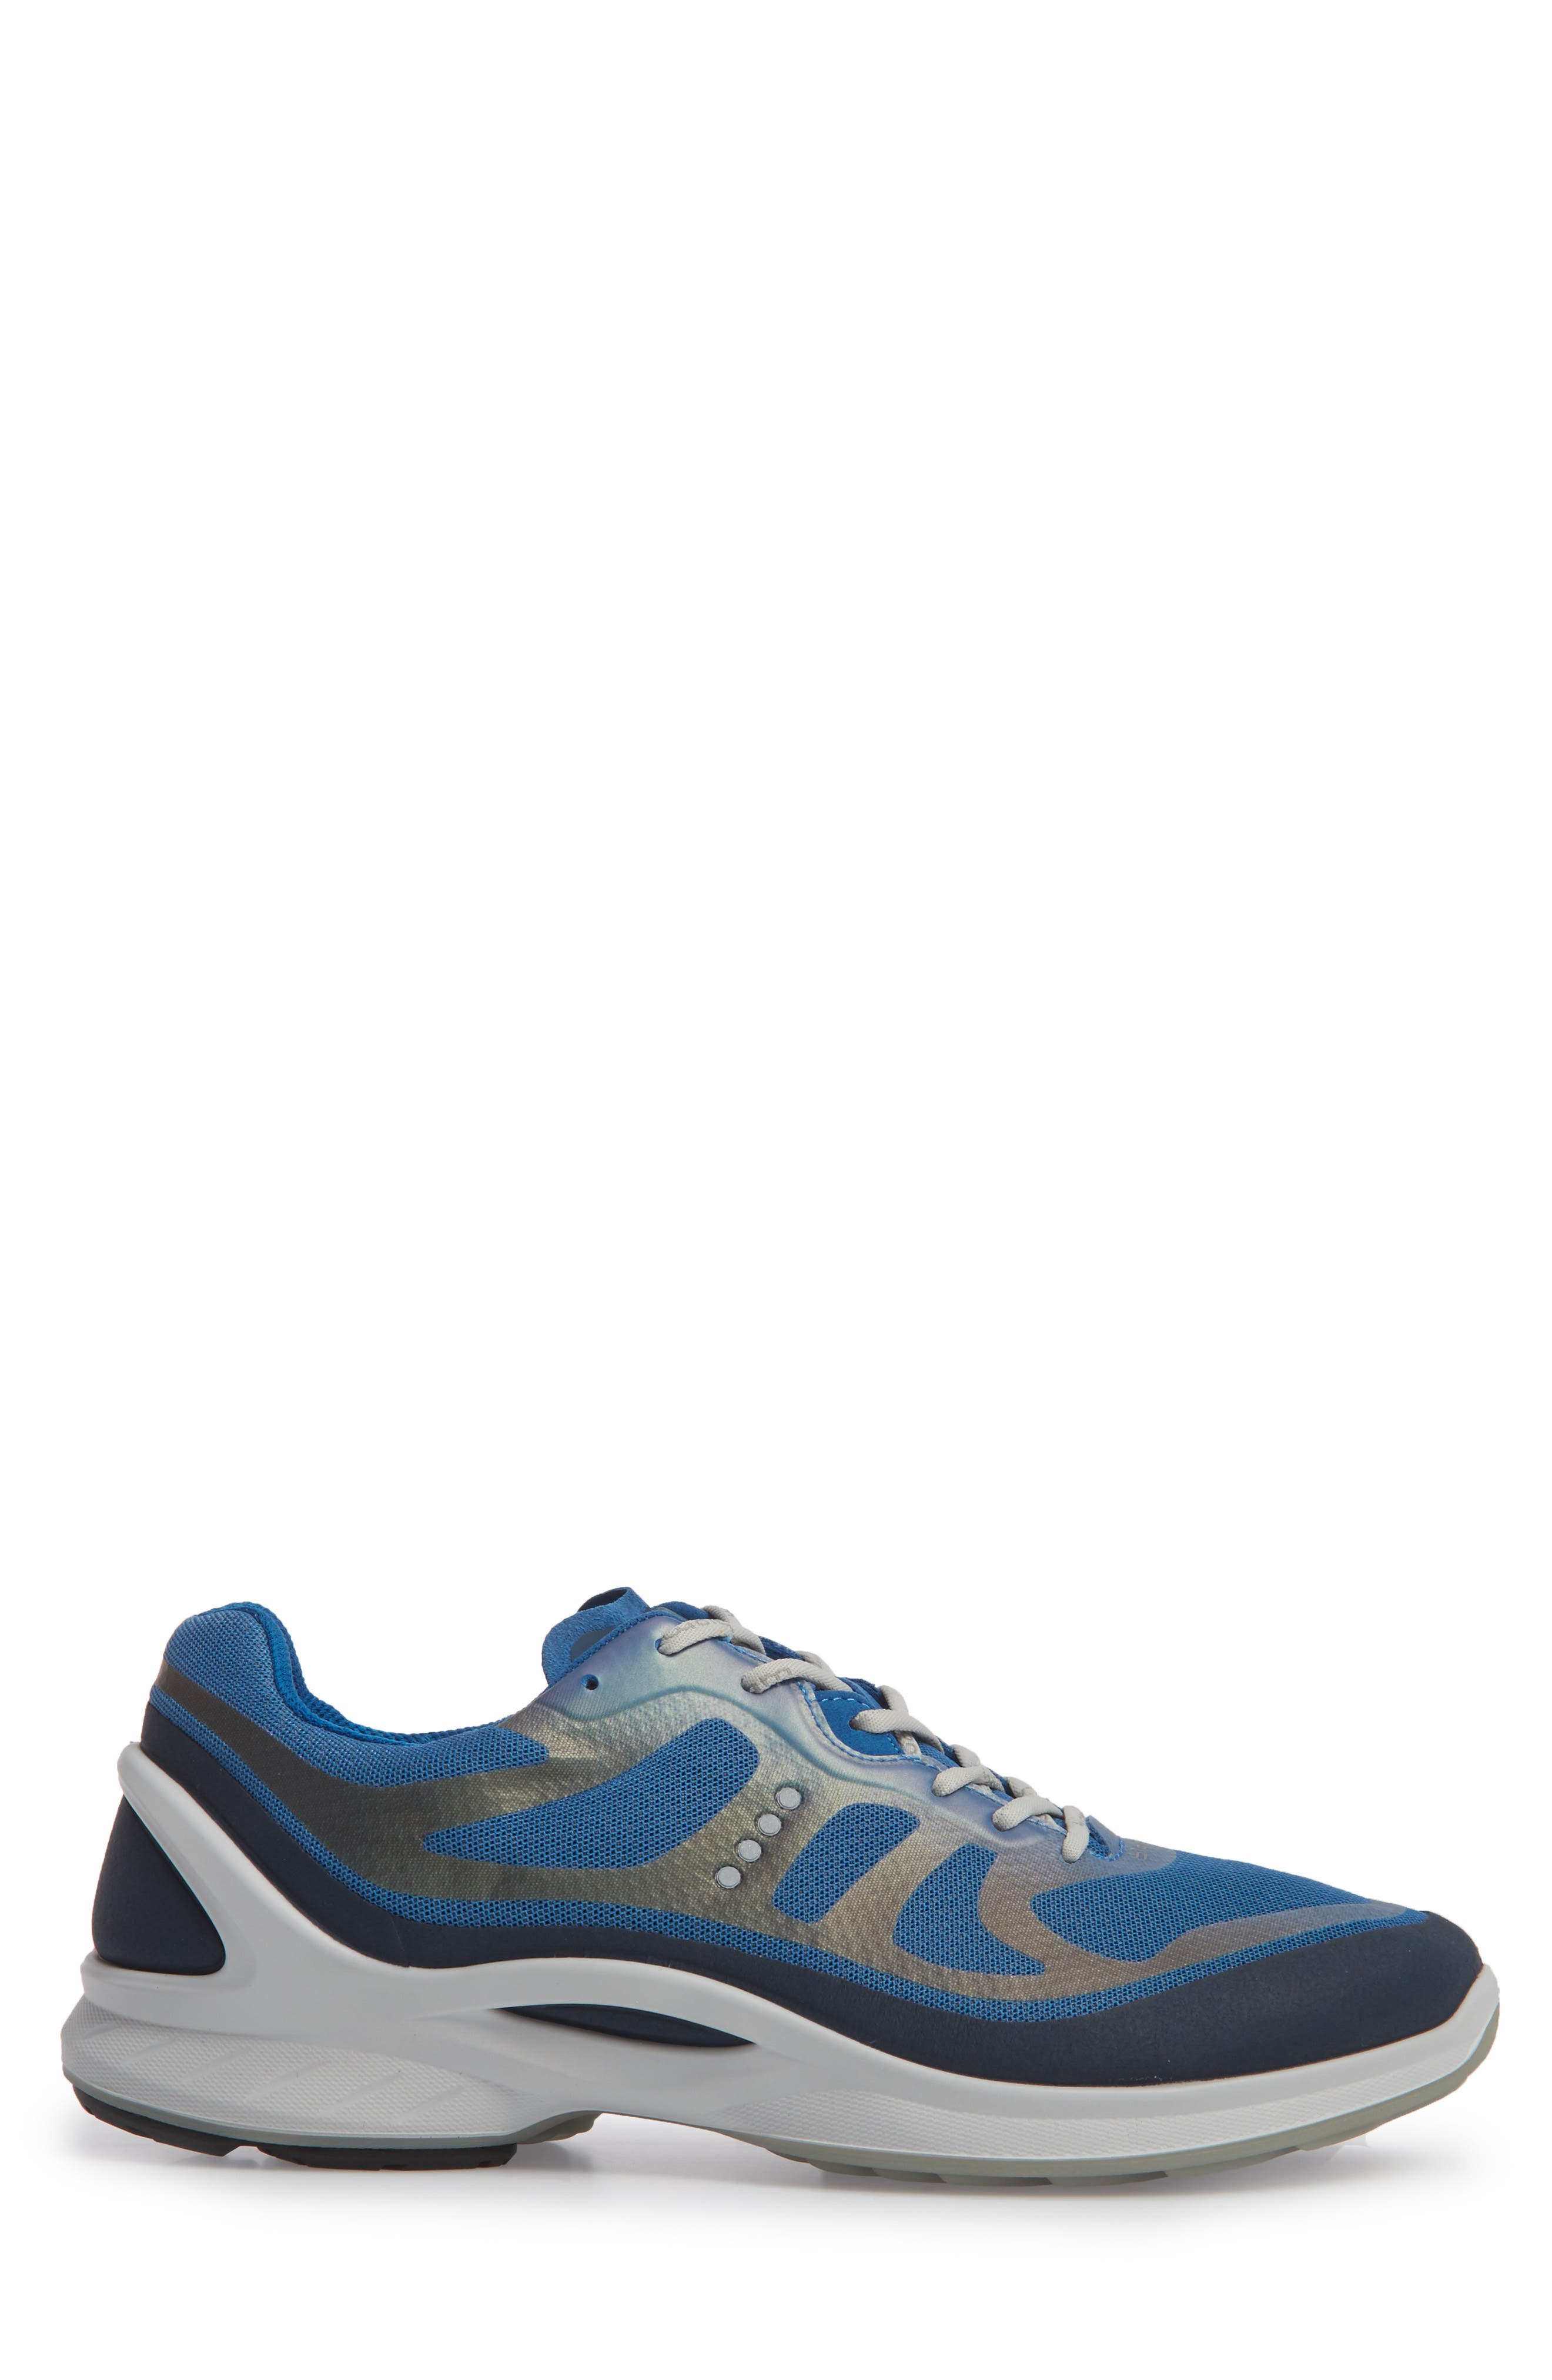 BIOM Fjuel Tie Sneaker,                             Alternate thumbnail 3, color,                             MARINE/ BLUE TEXTILE